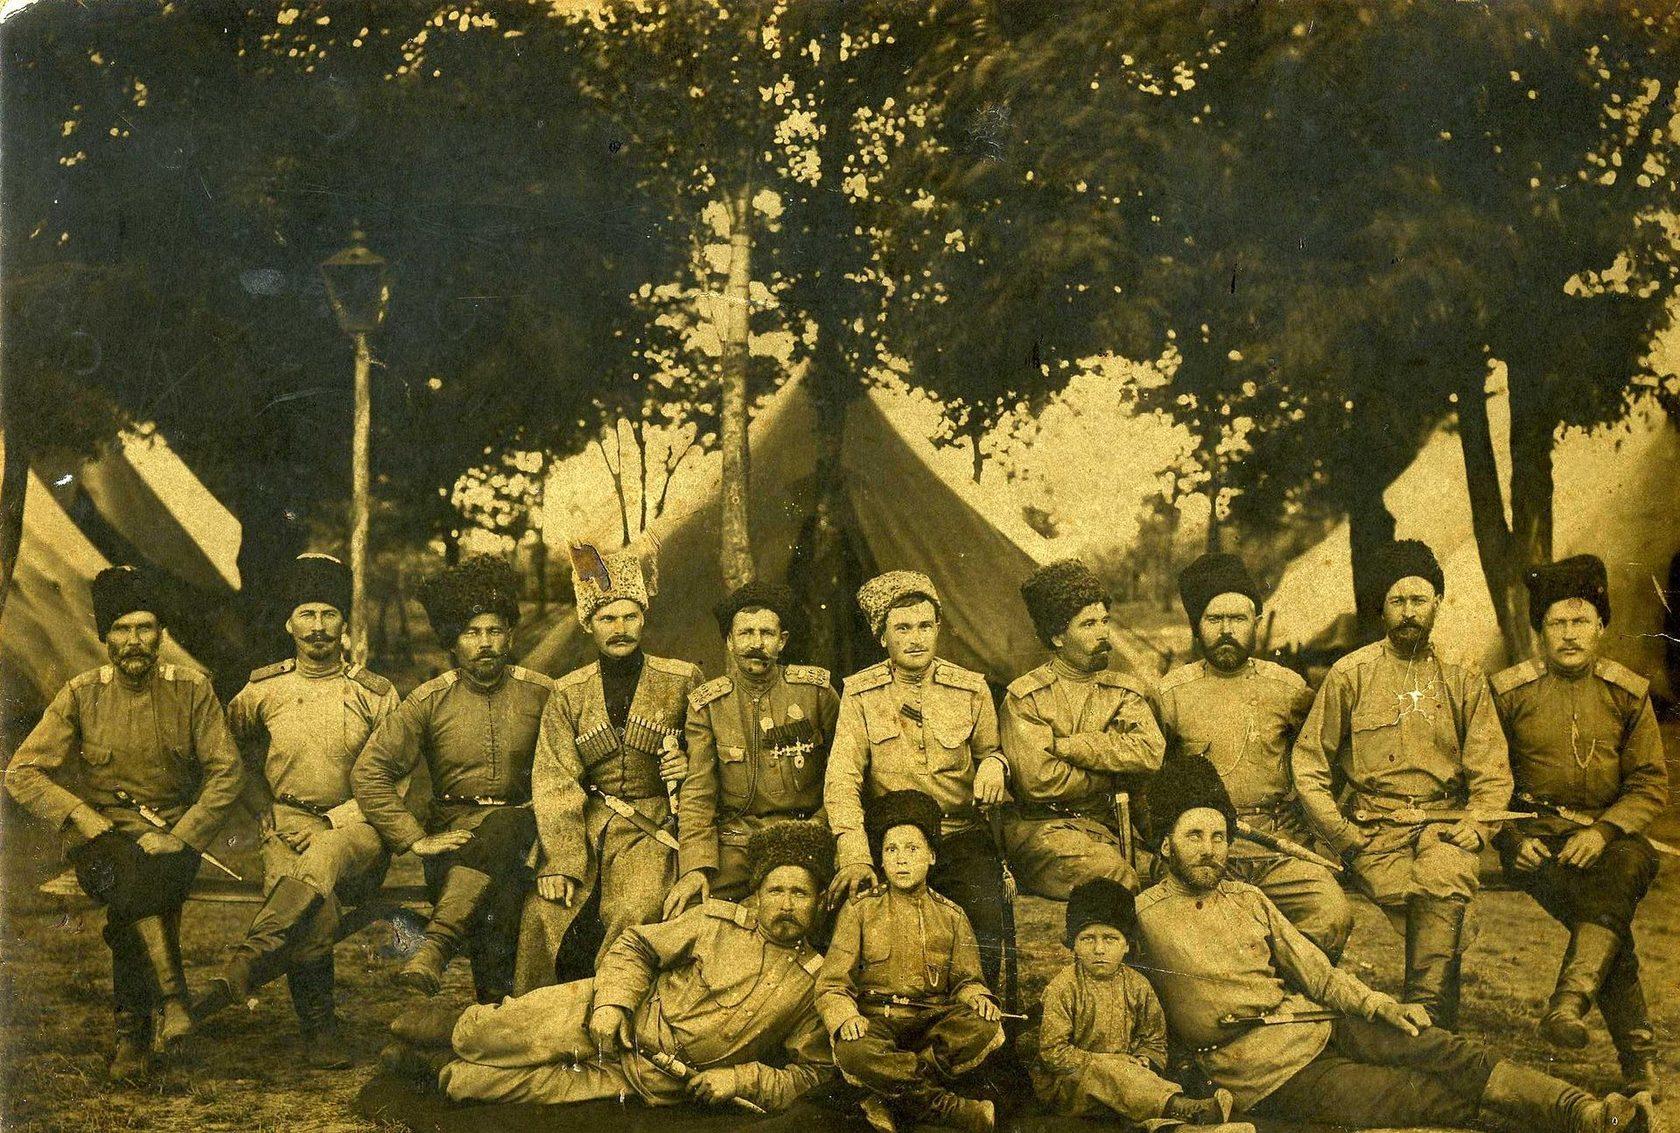 Источник: https://ru.wikipedia.org/wiki/Казаки#/media/Файл:Cossacks._May_5,_1916._Goryachy_Klyuch._Russian_Empire.JPG